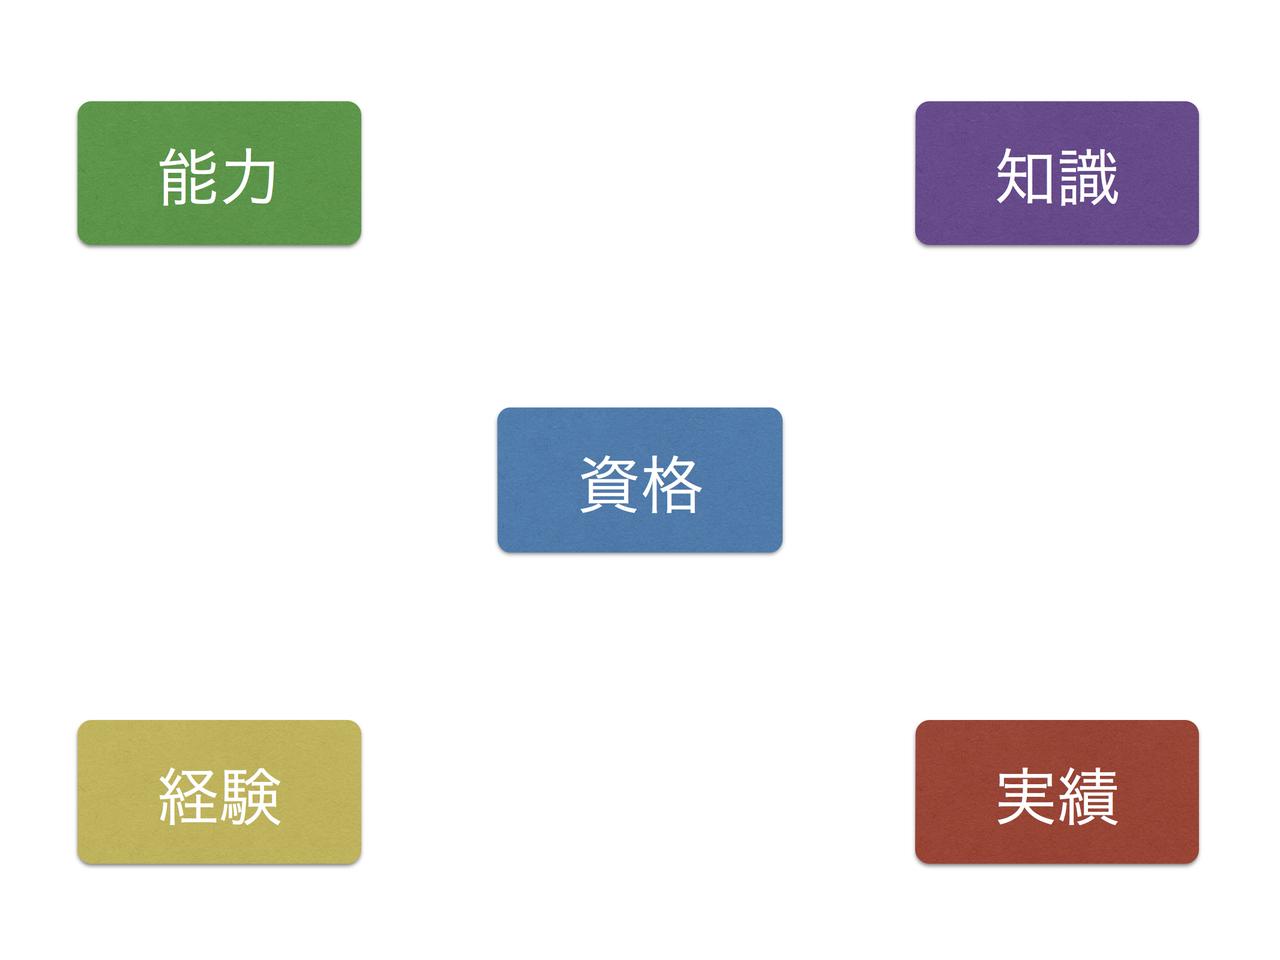 Presentation-1